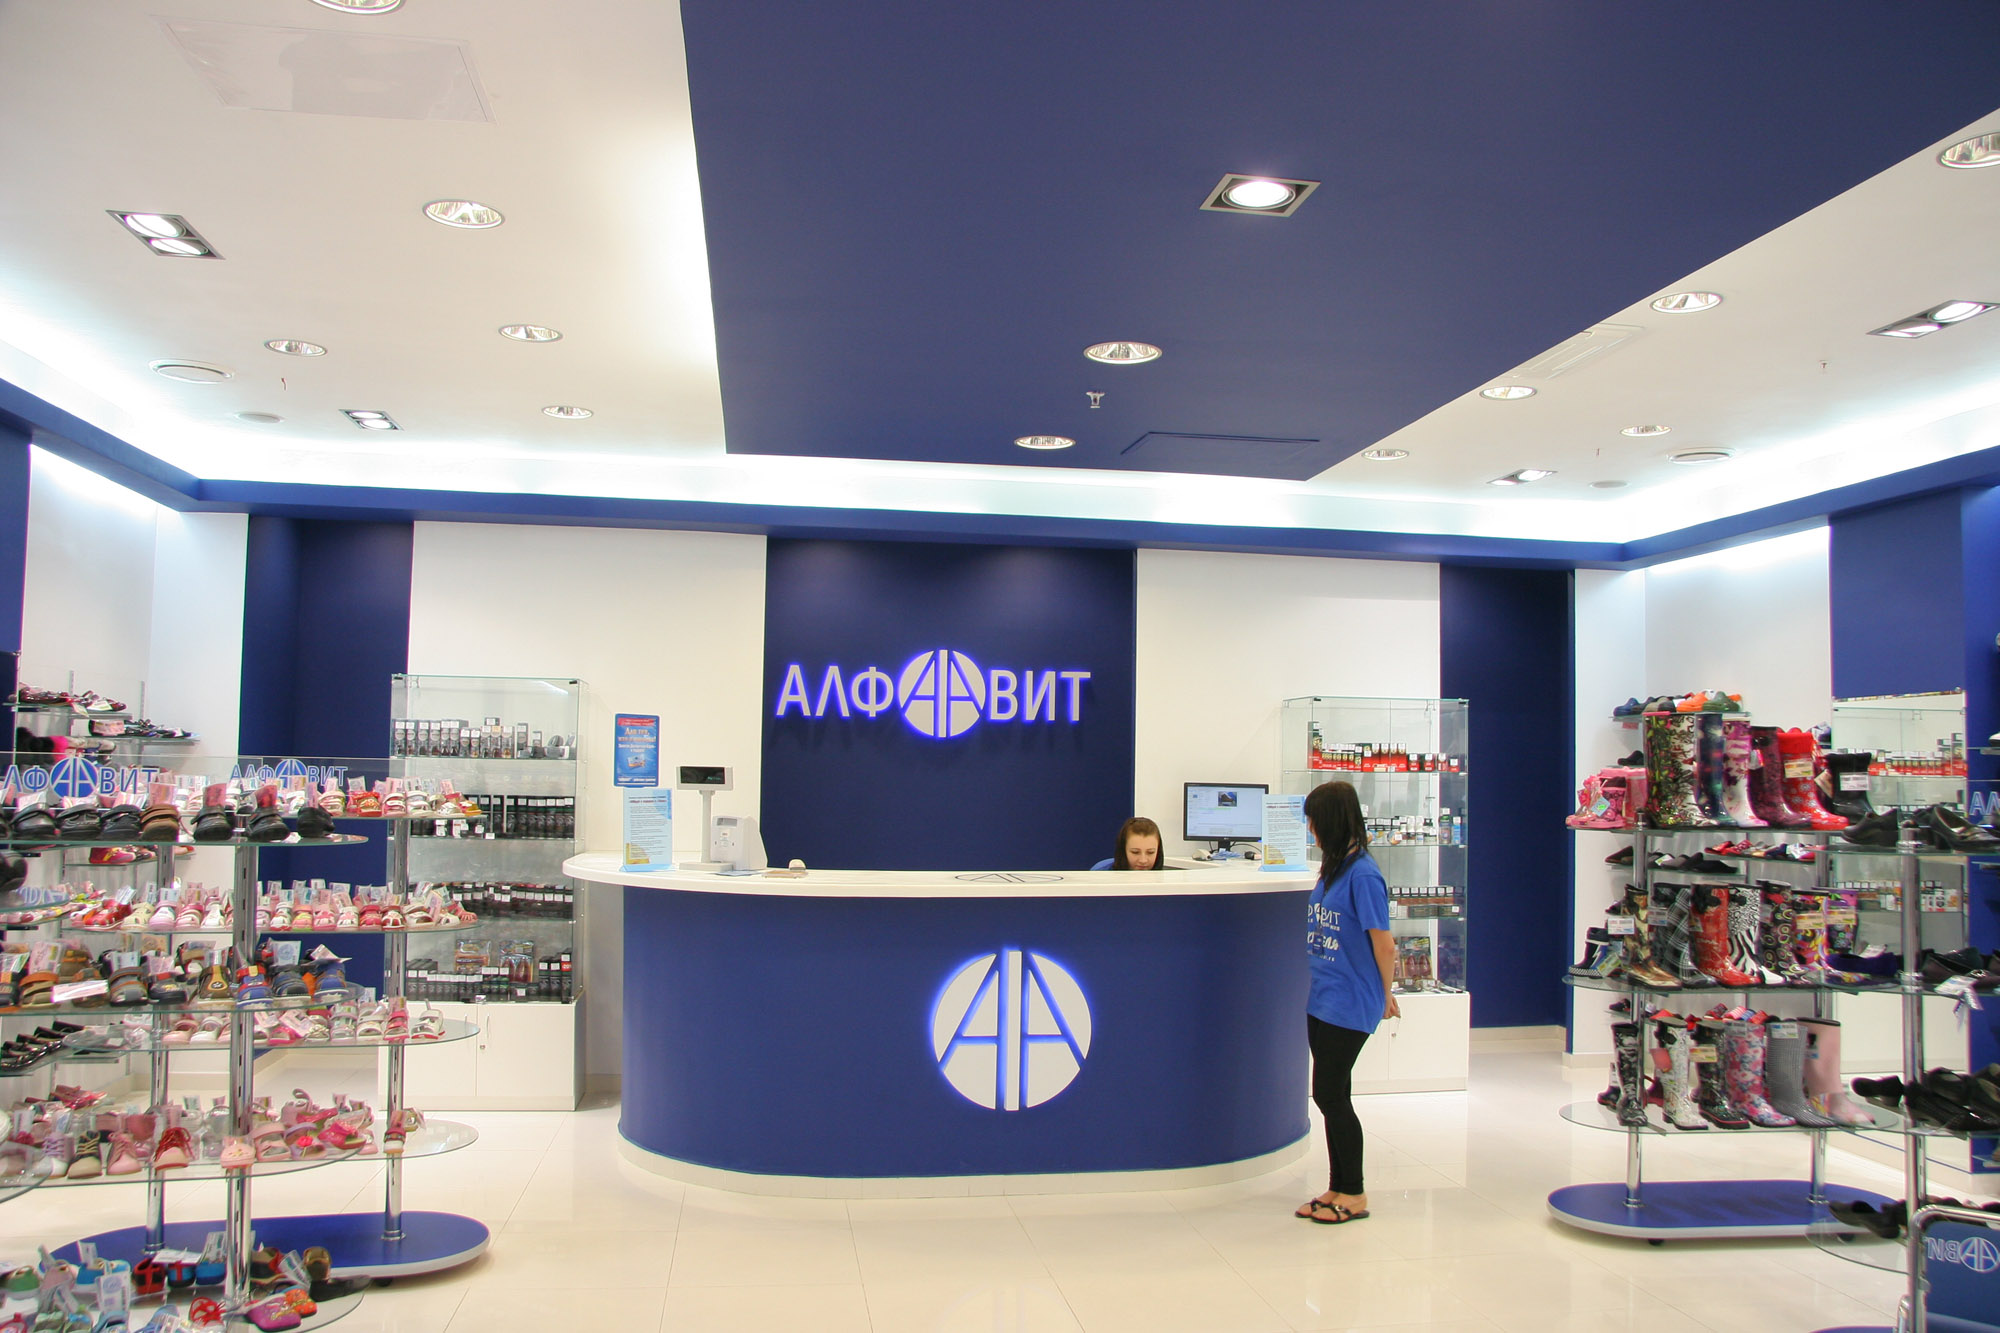 Товар магазина Алфавит